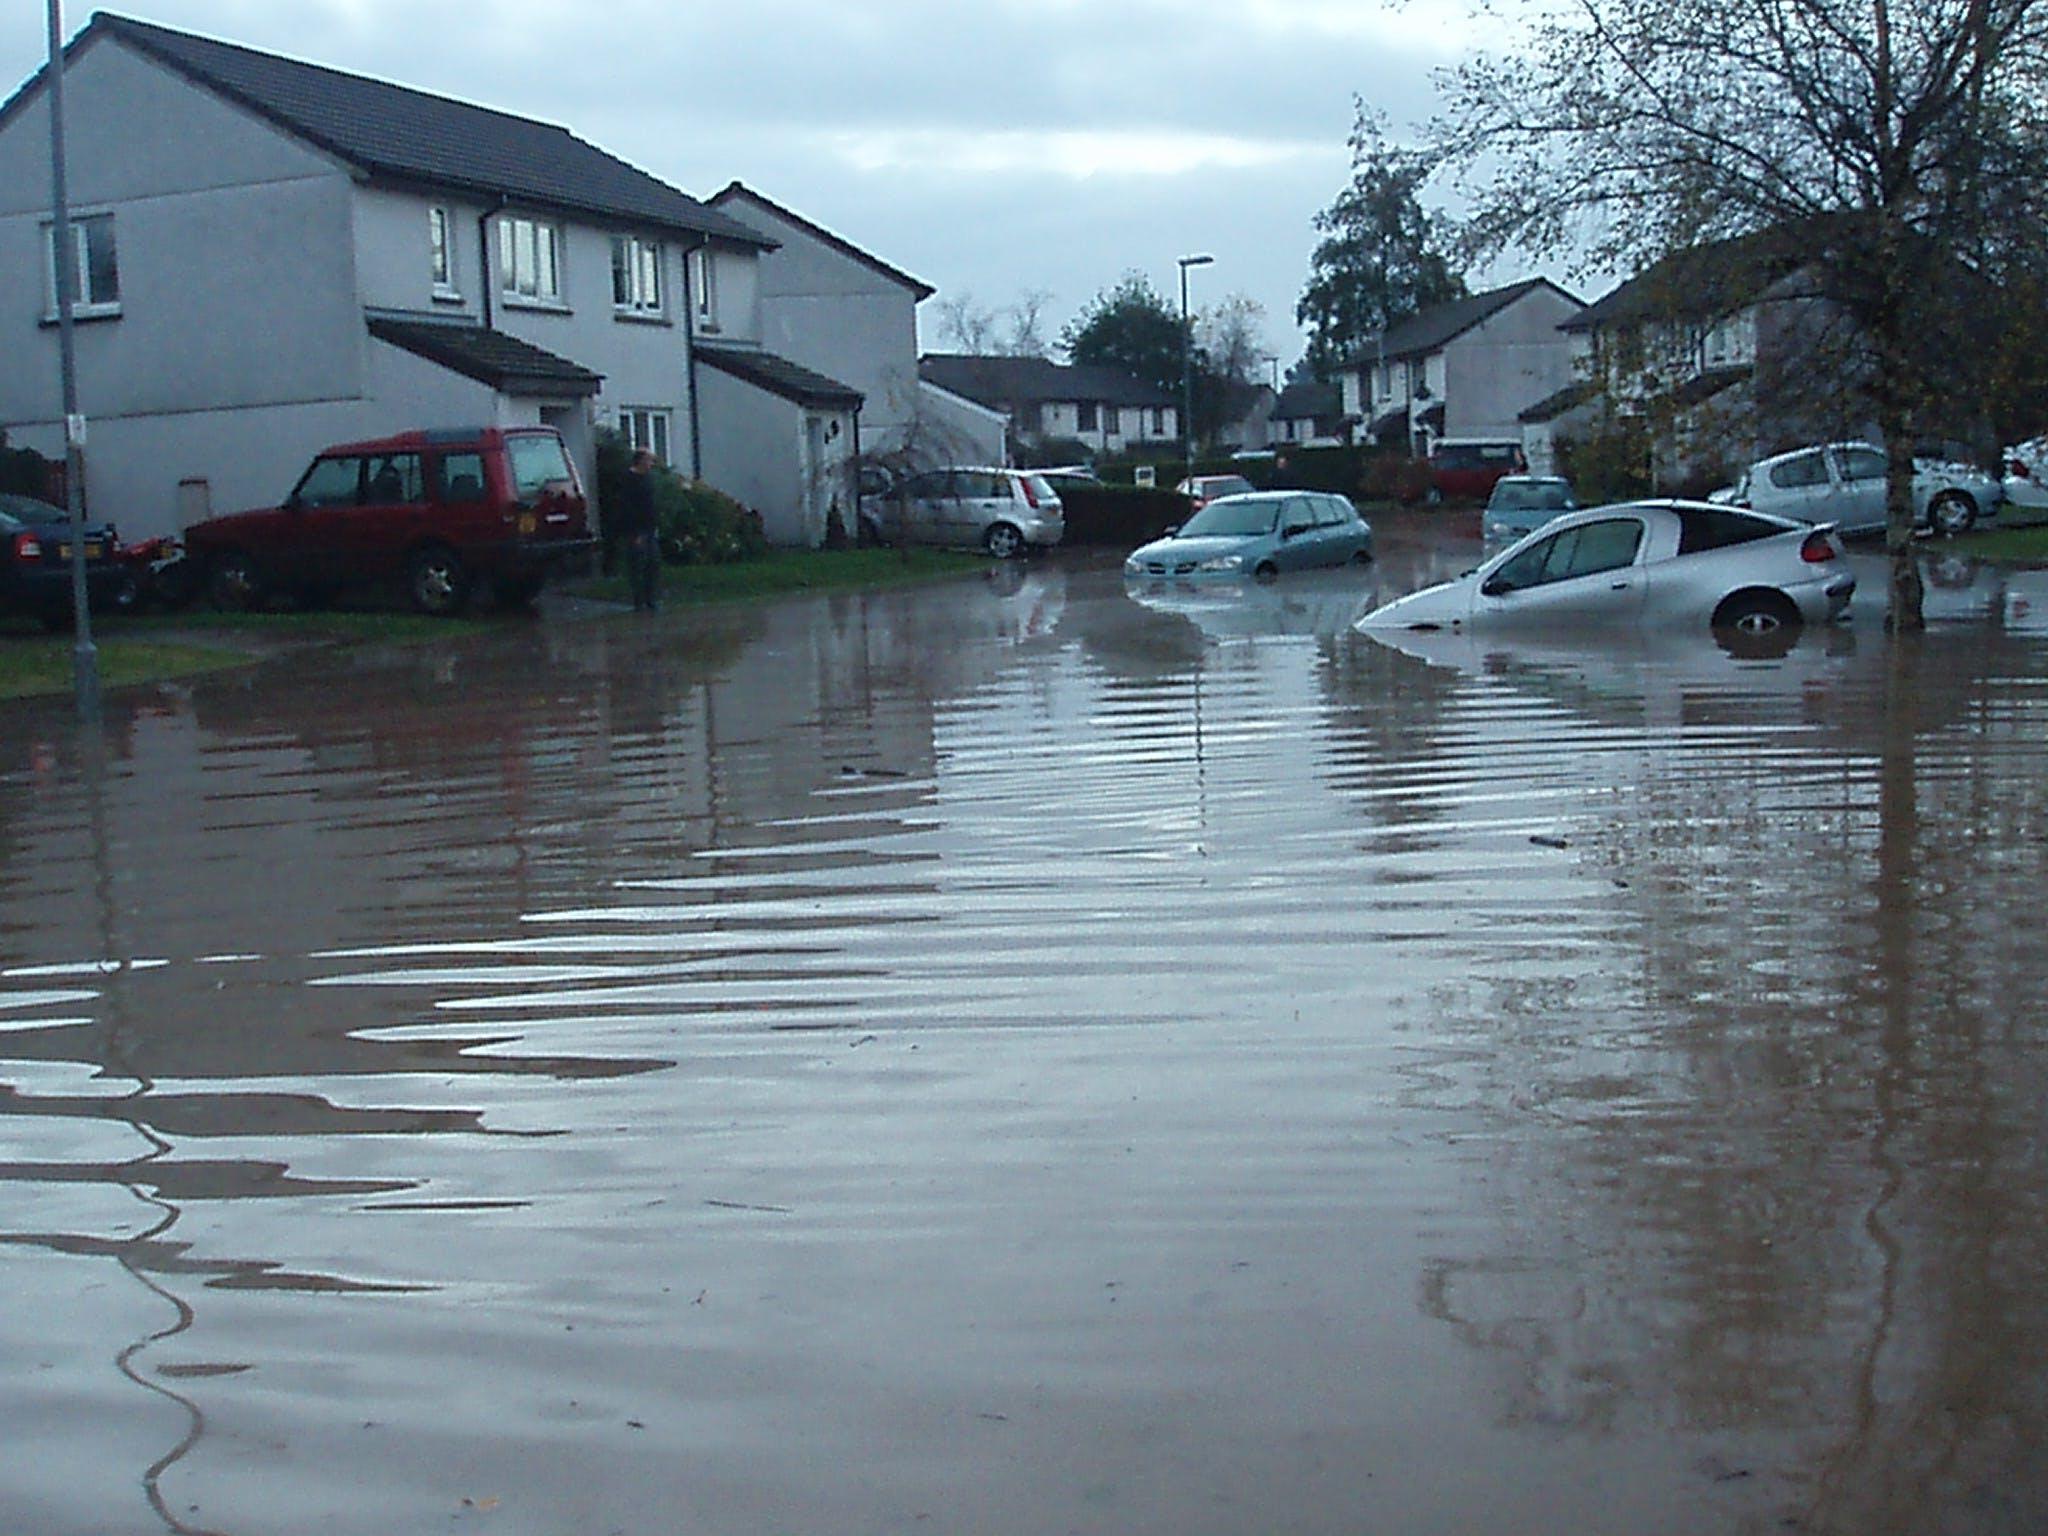 Aberdeen Close full of flood water  up to car bonnet level